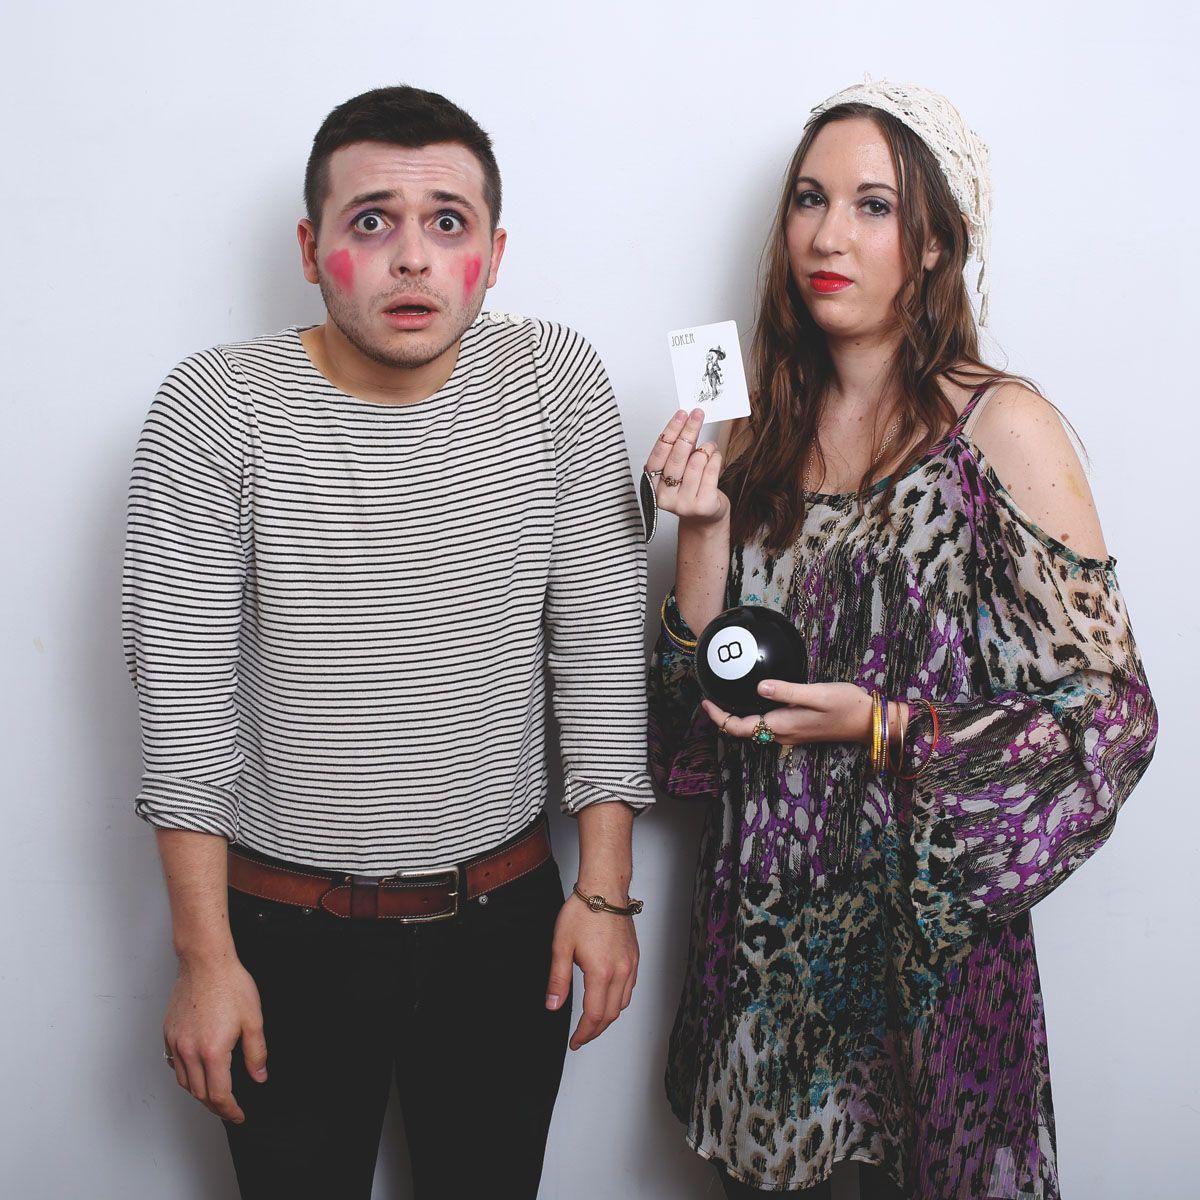 diy halloween costume: mime | joey, fortune teller | phoebe | inside